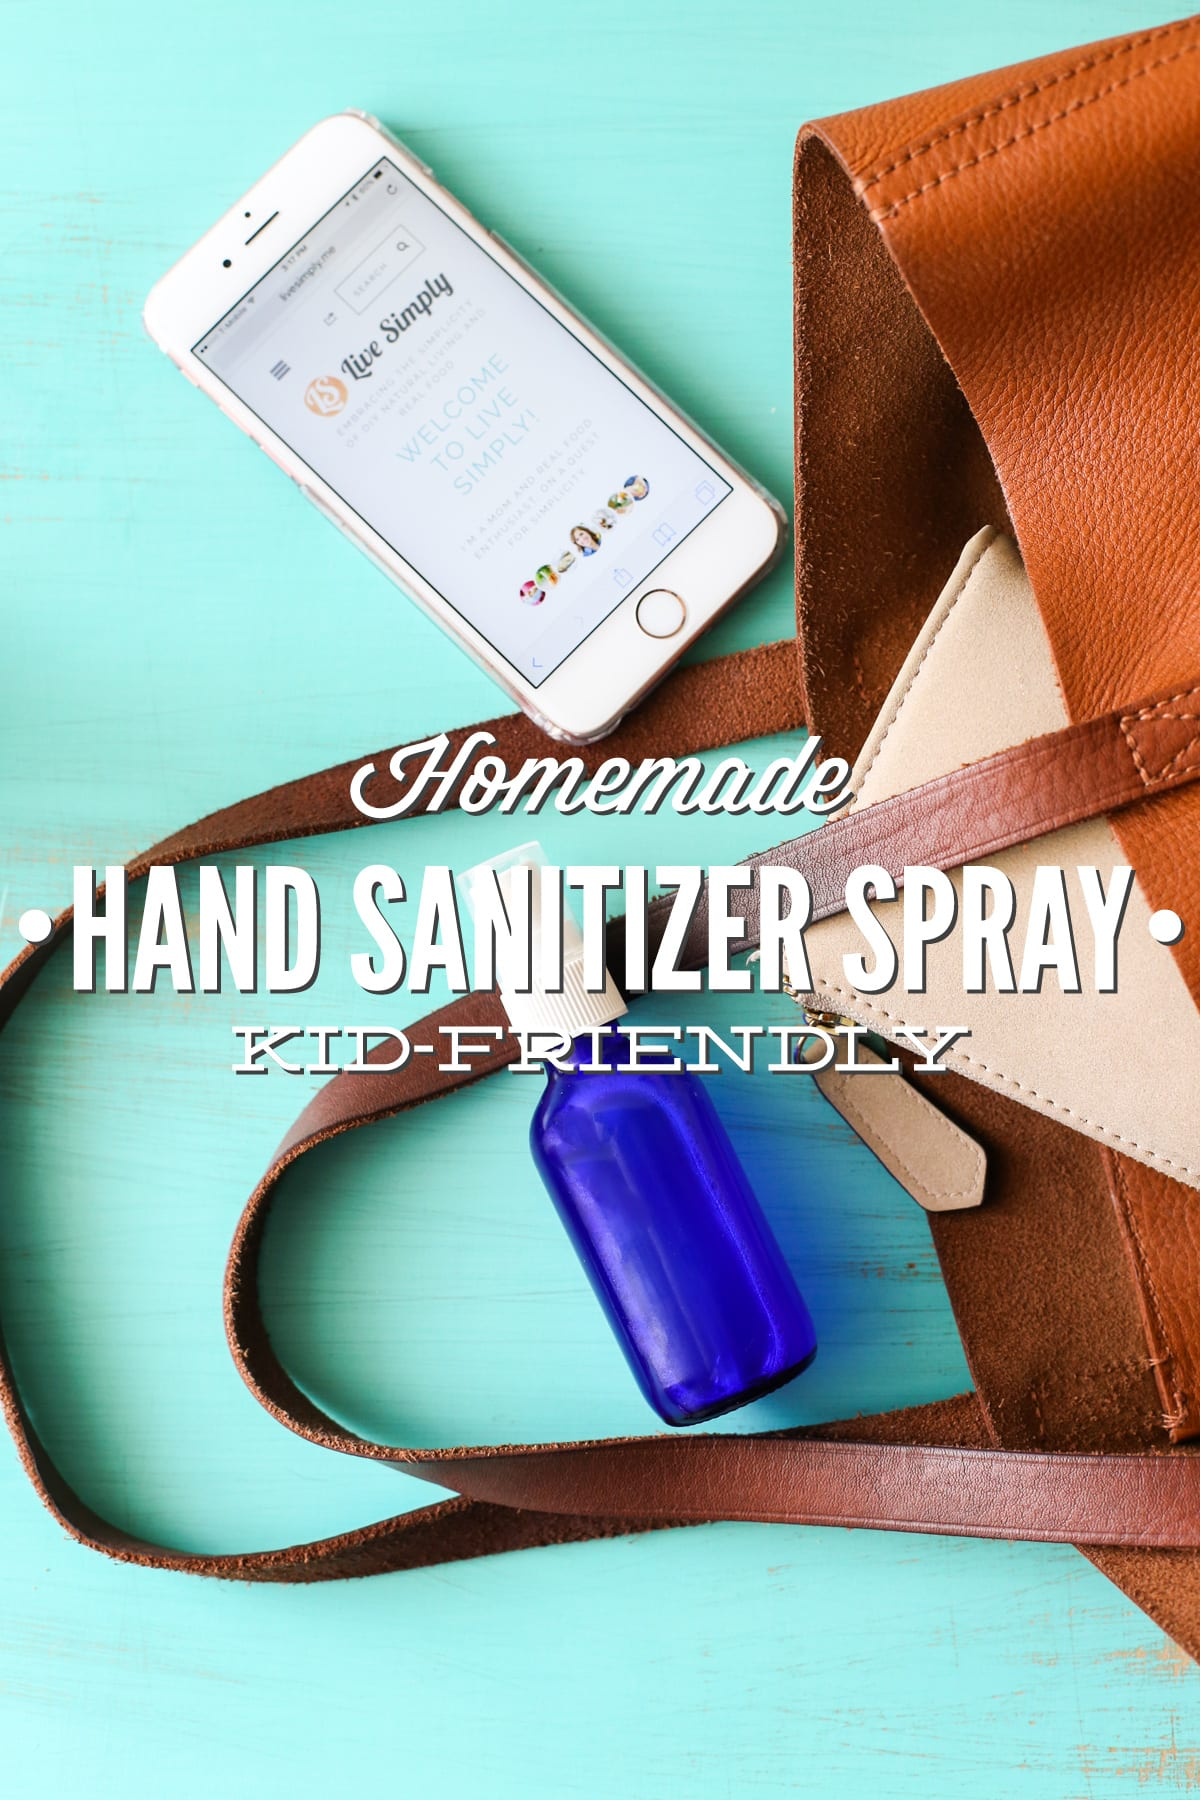 Homemade Hand Sanitizer Spray Kid-Friendly